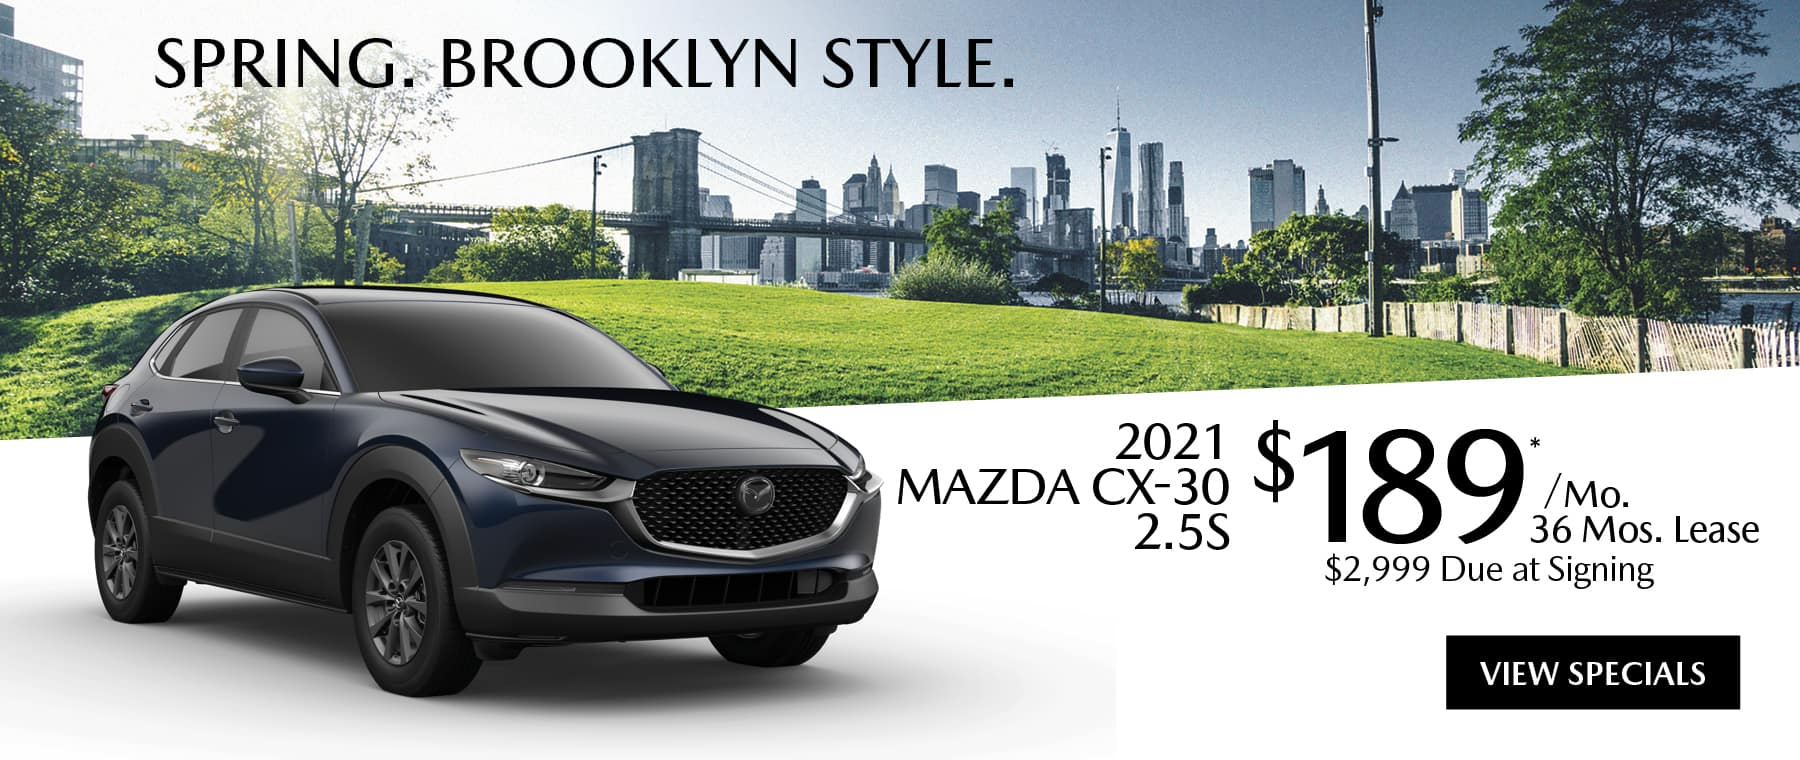 Mazda CX-30 Special